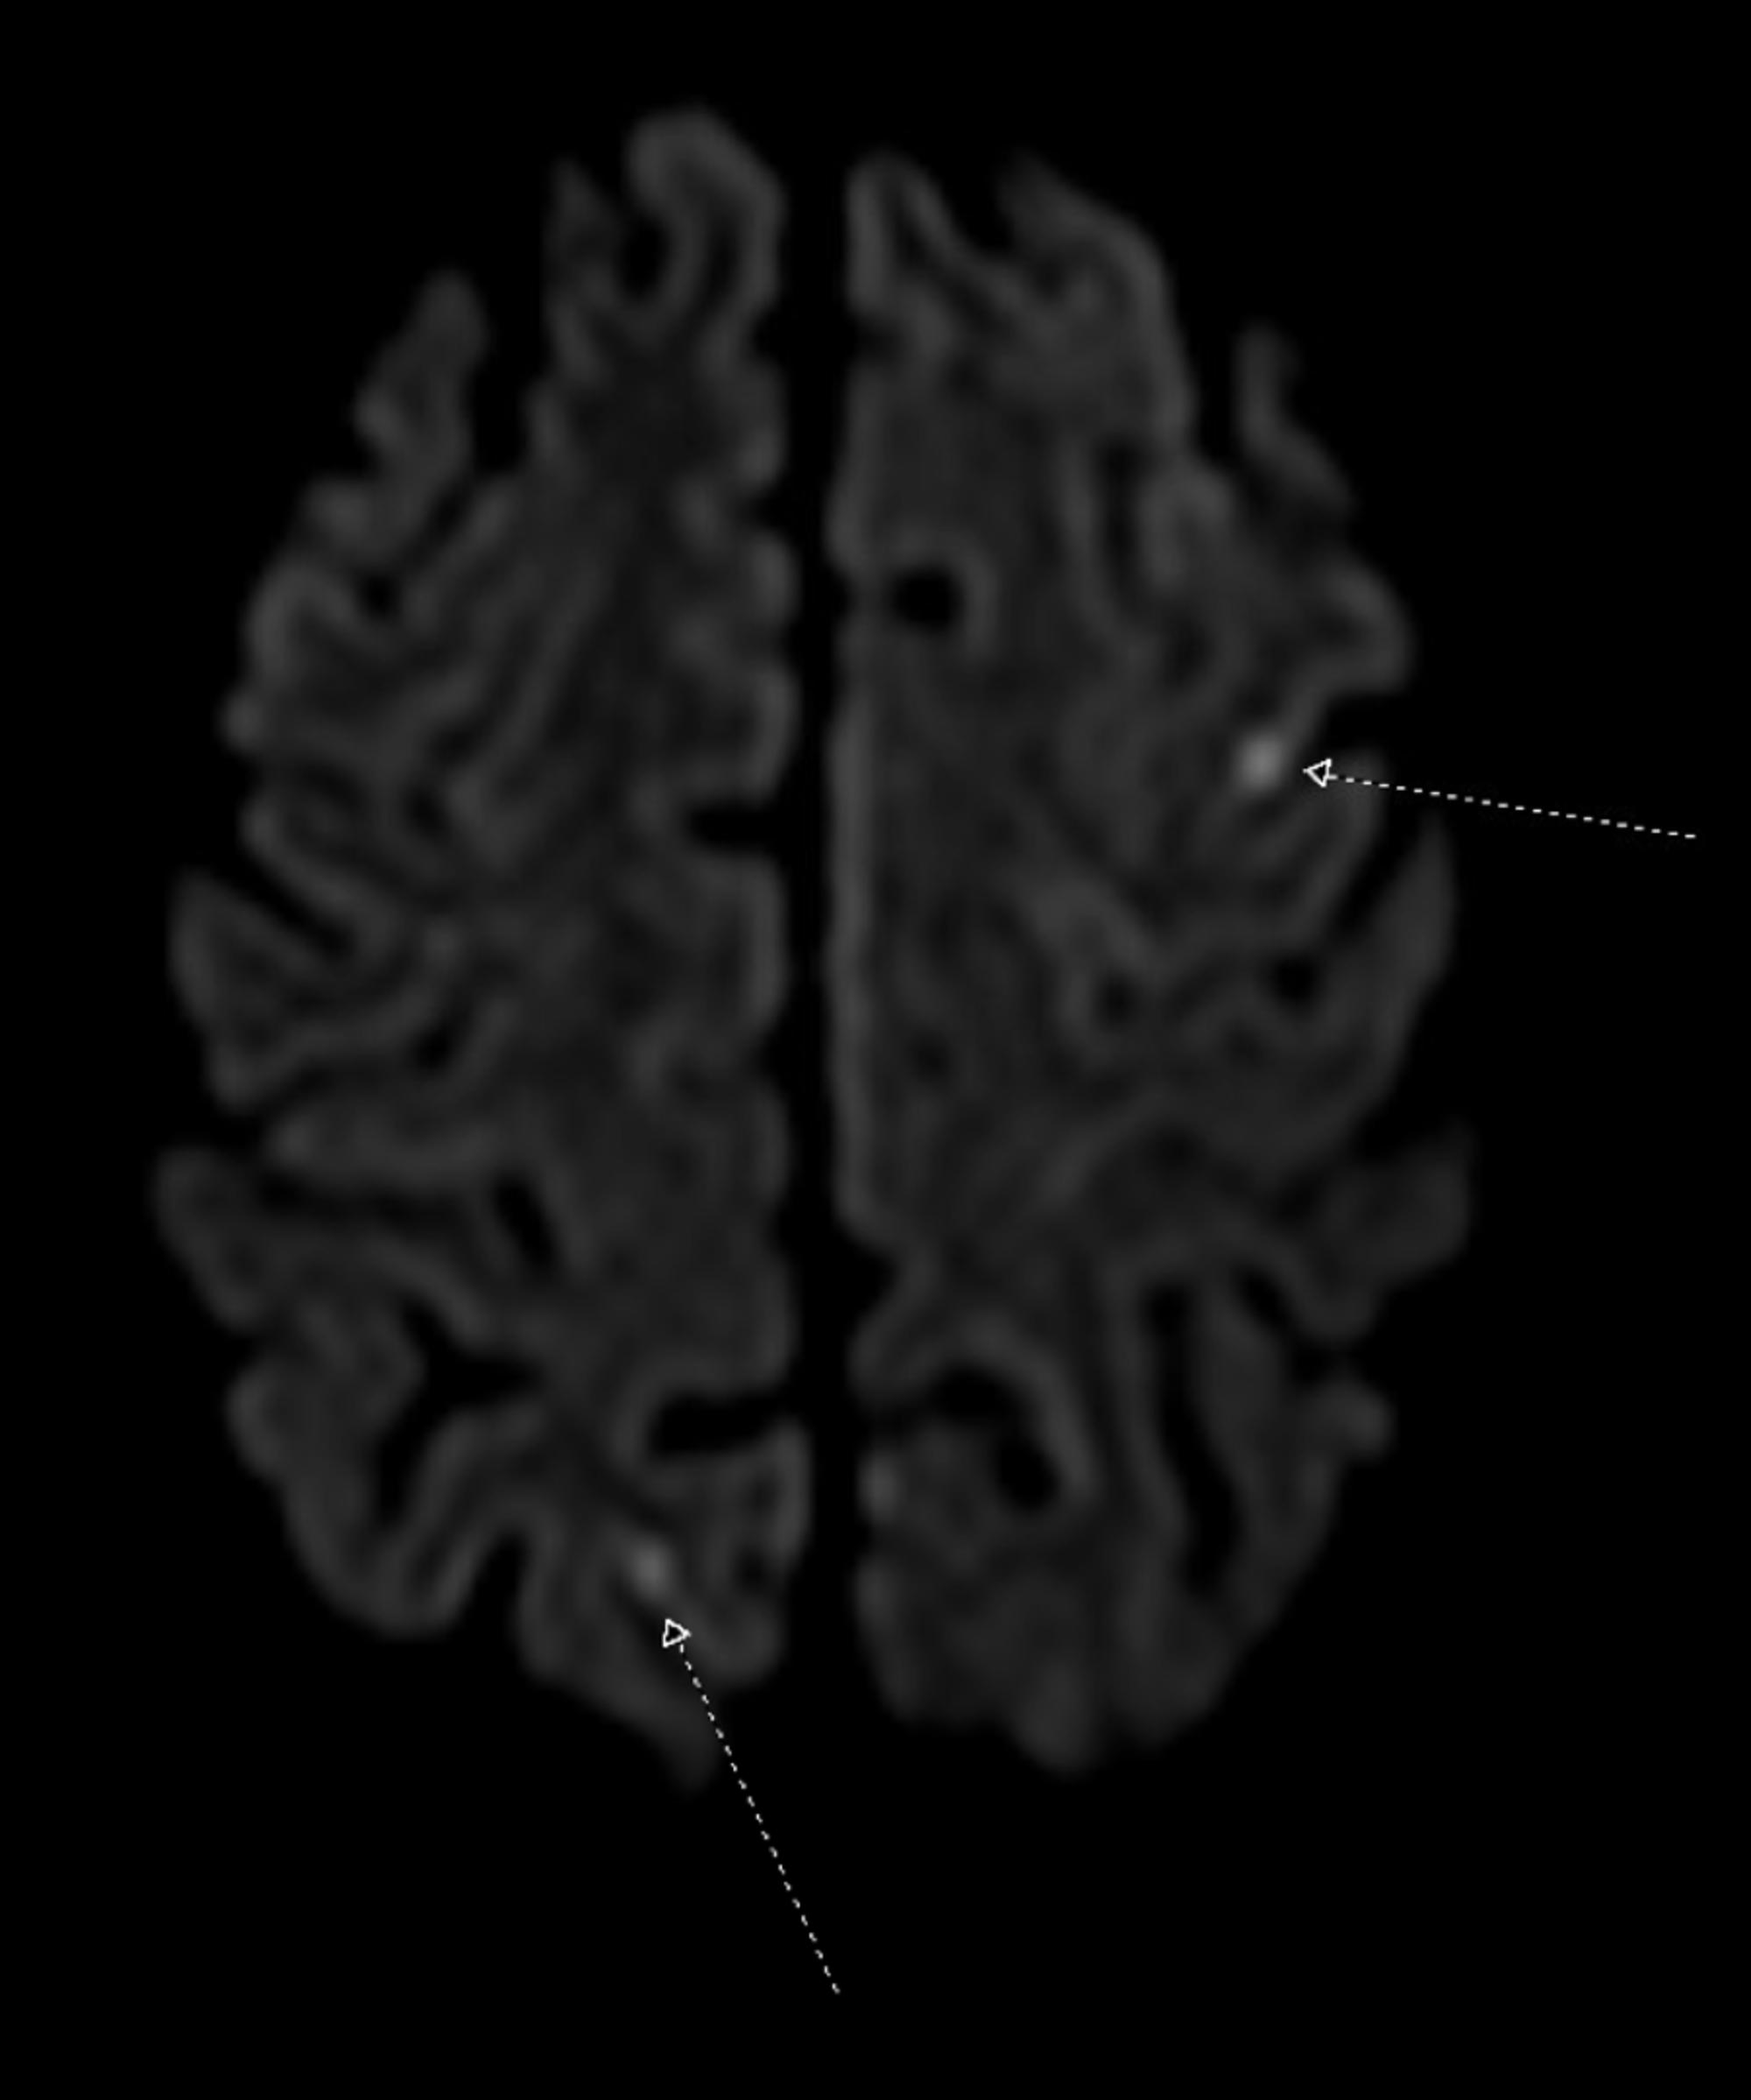 Cureus | Reversible Cerebral Vasoconstriction Disorder in a Patient